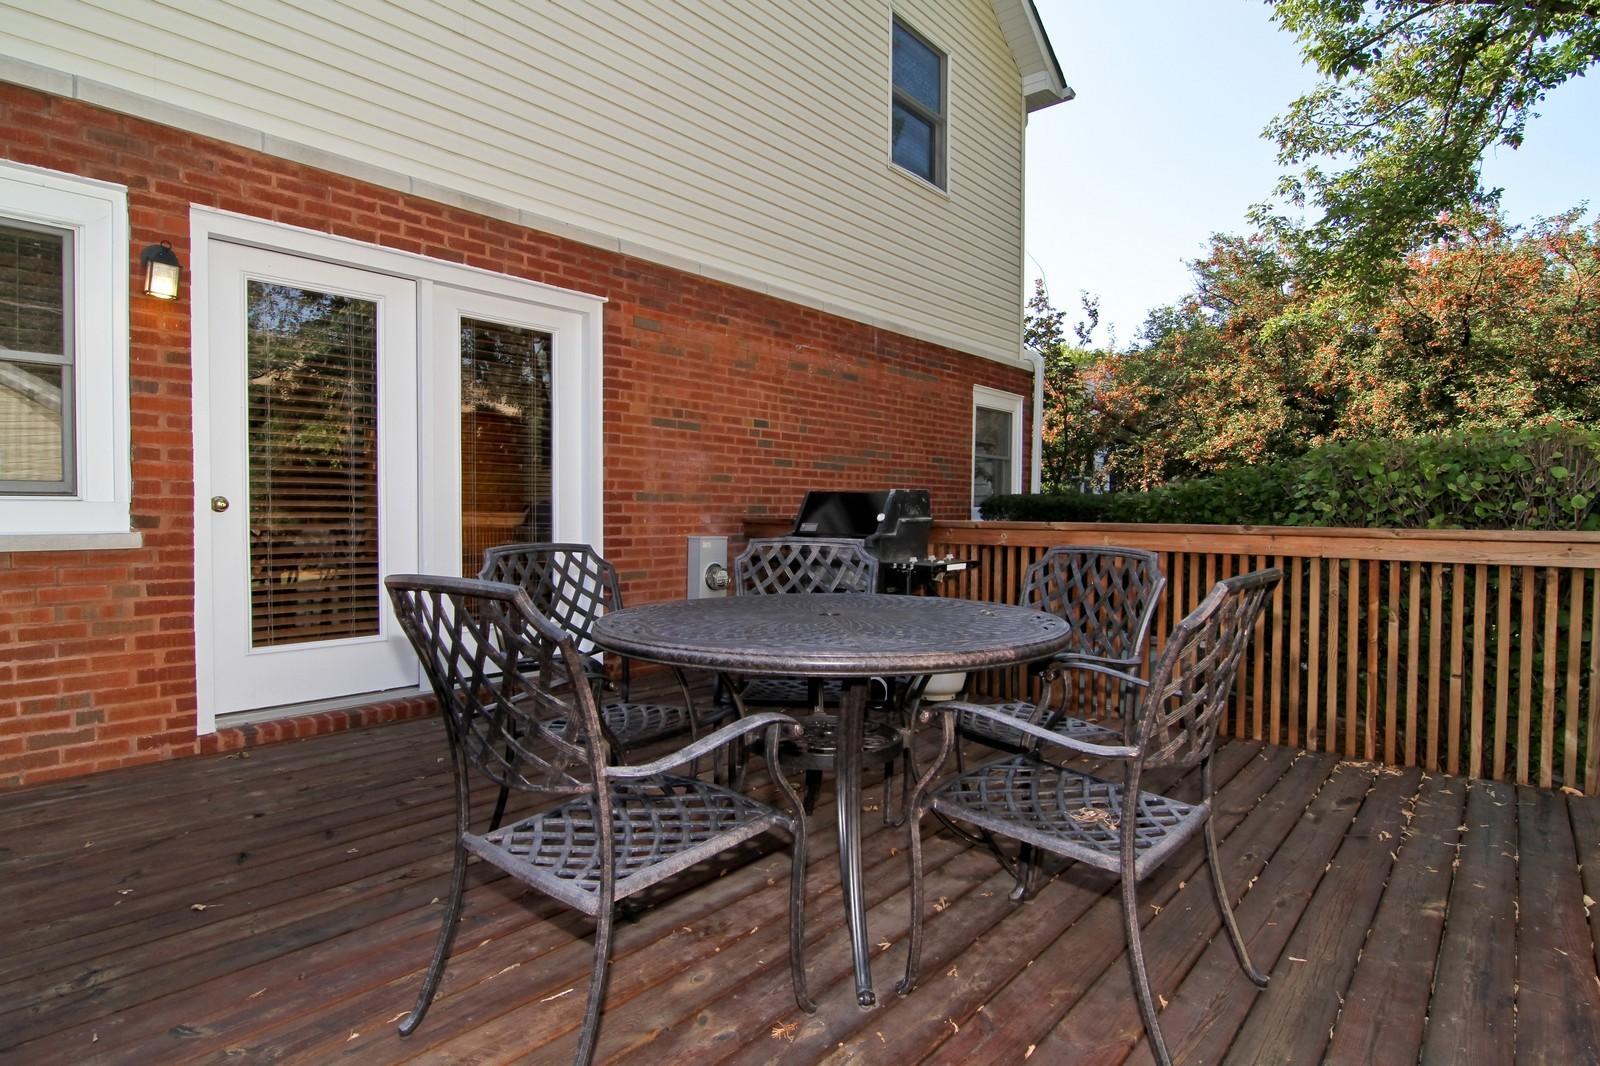 Real Estate Photography - 441 Edgewood Dr, La Grange, IL, 60525 - Patio